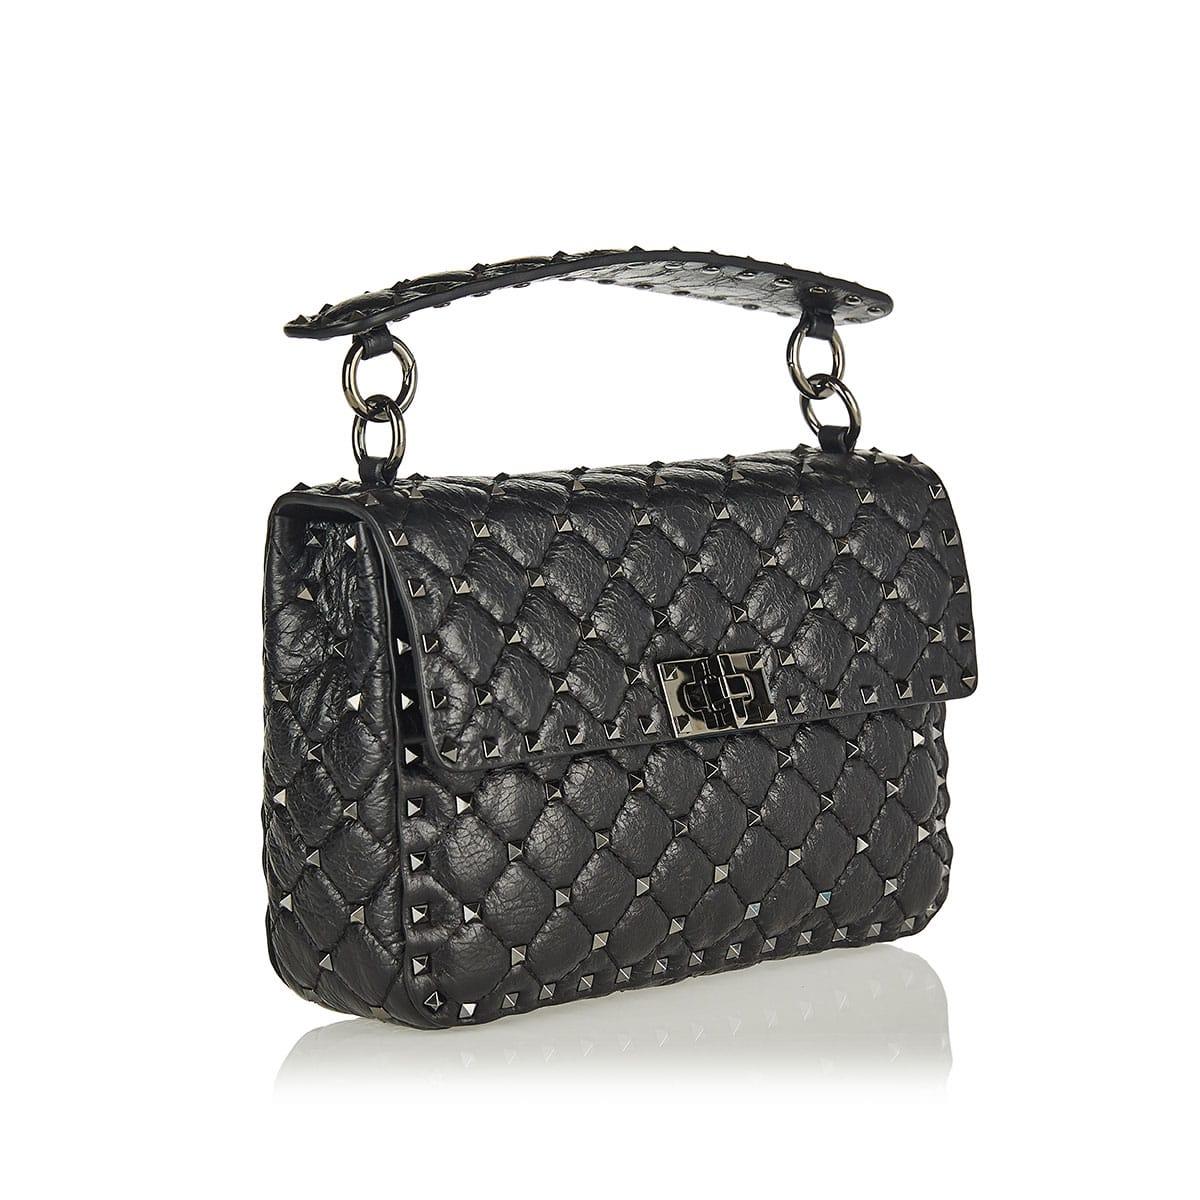 Rockstud Spike crackle-leather chain bag